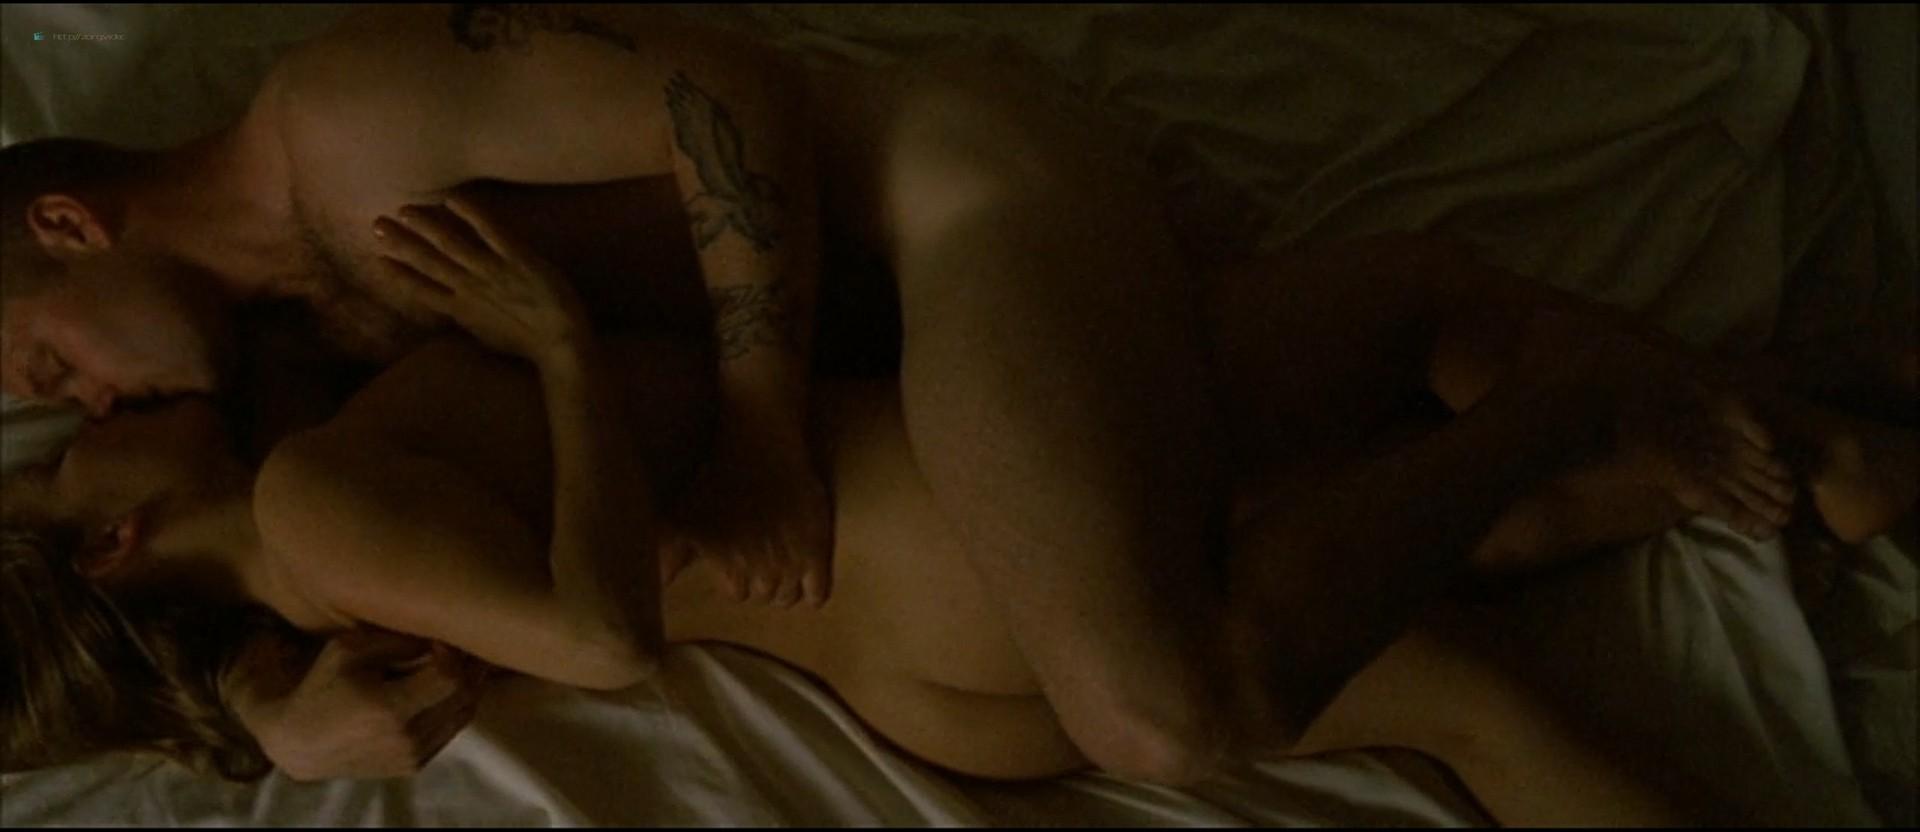 Signe Egholm Olsen nude hot sex Pernille Vallentin nude sex too - Nordkraft (DK-2005) HD 1080p Web (2)